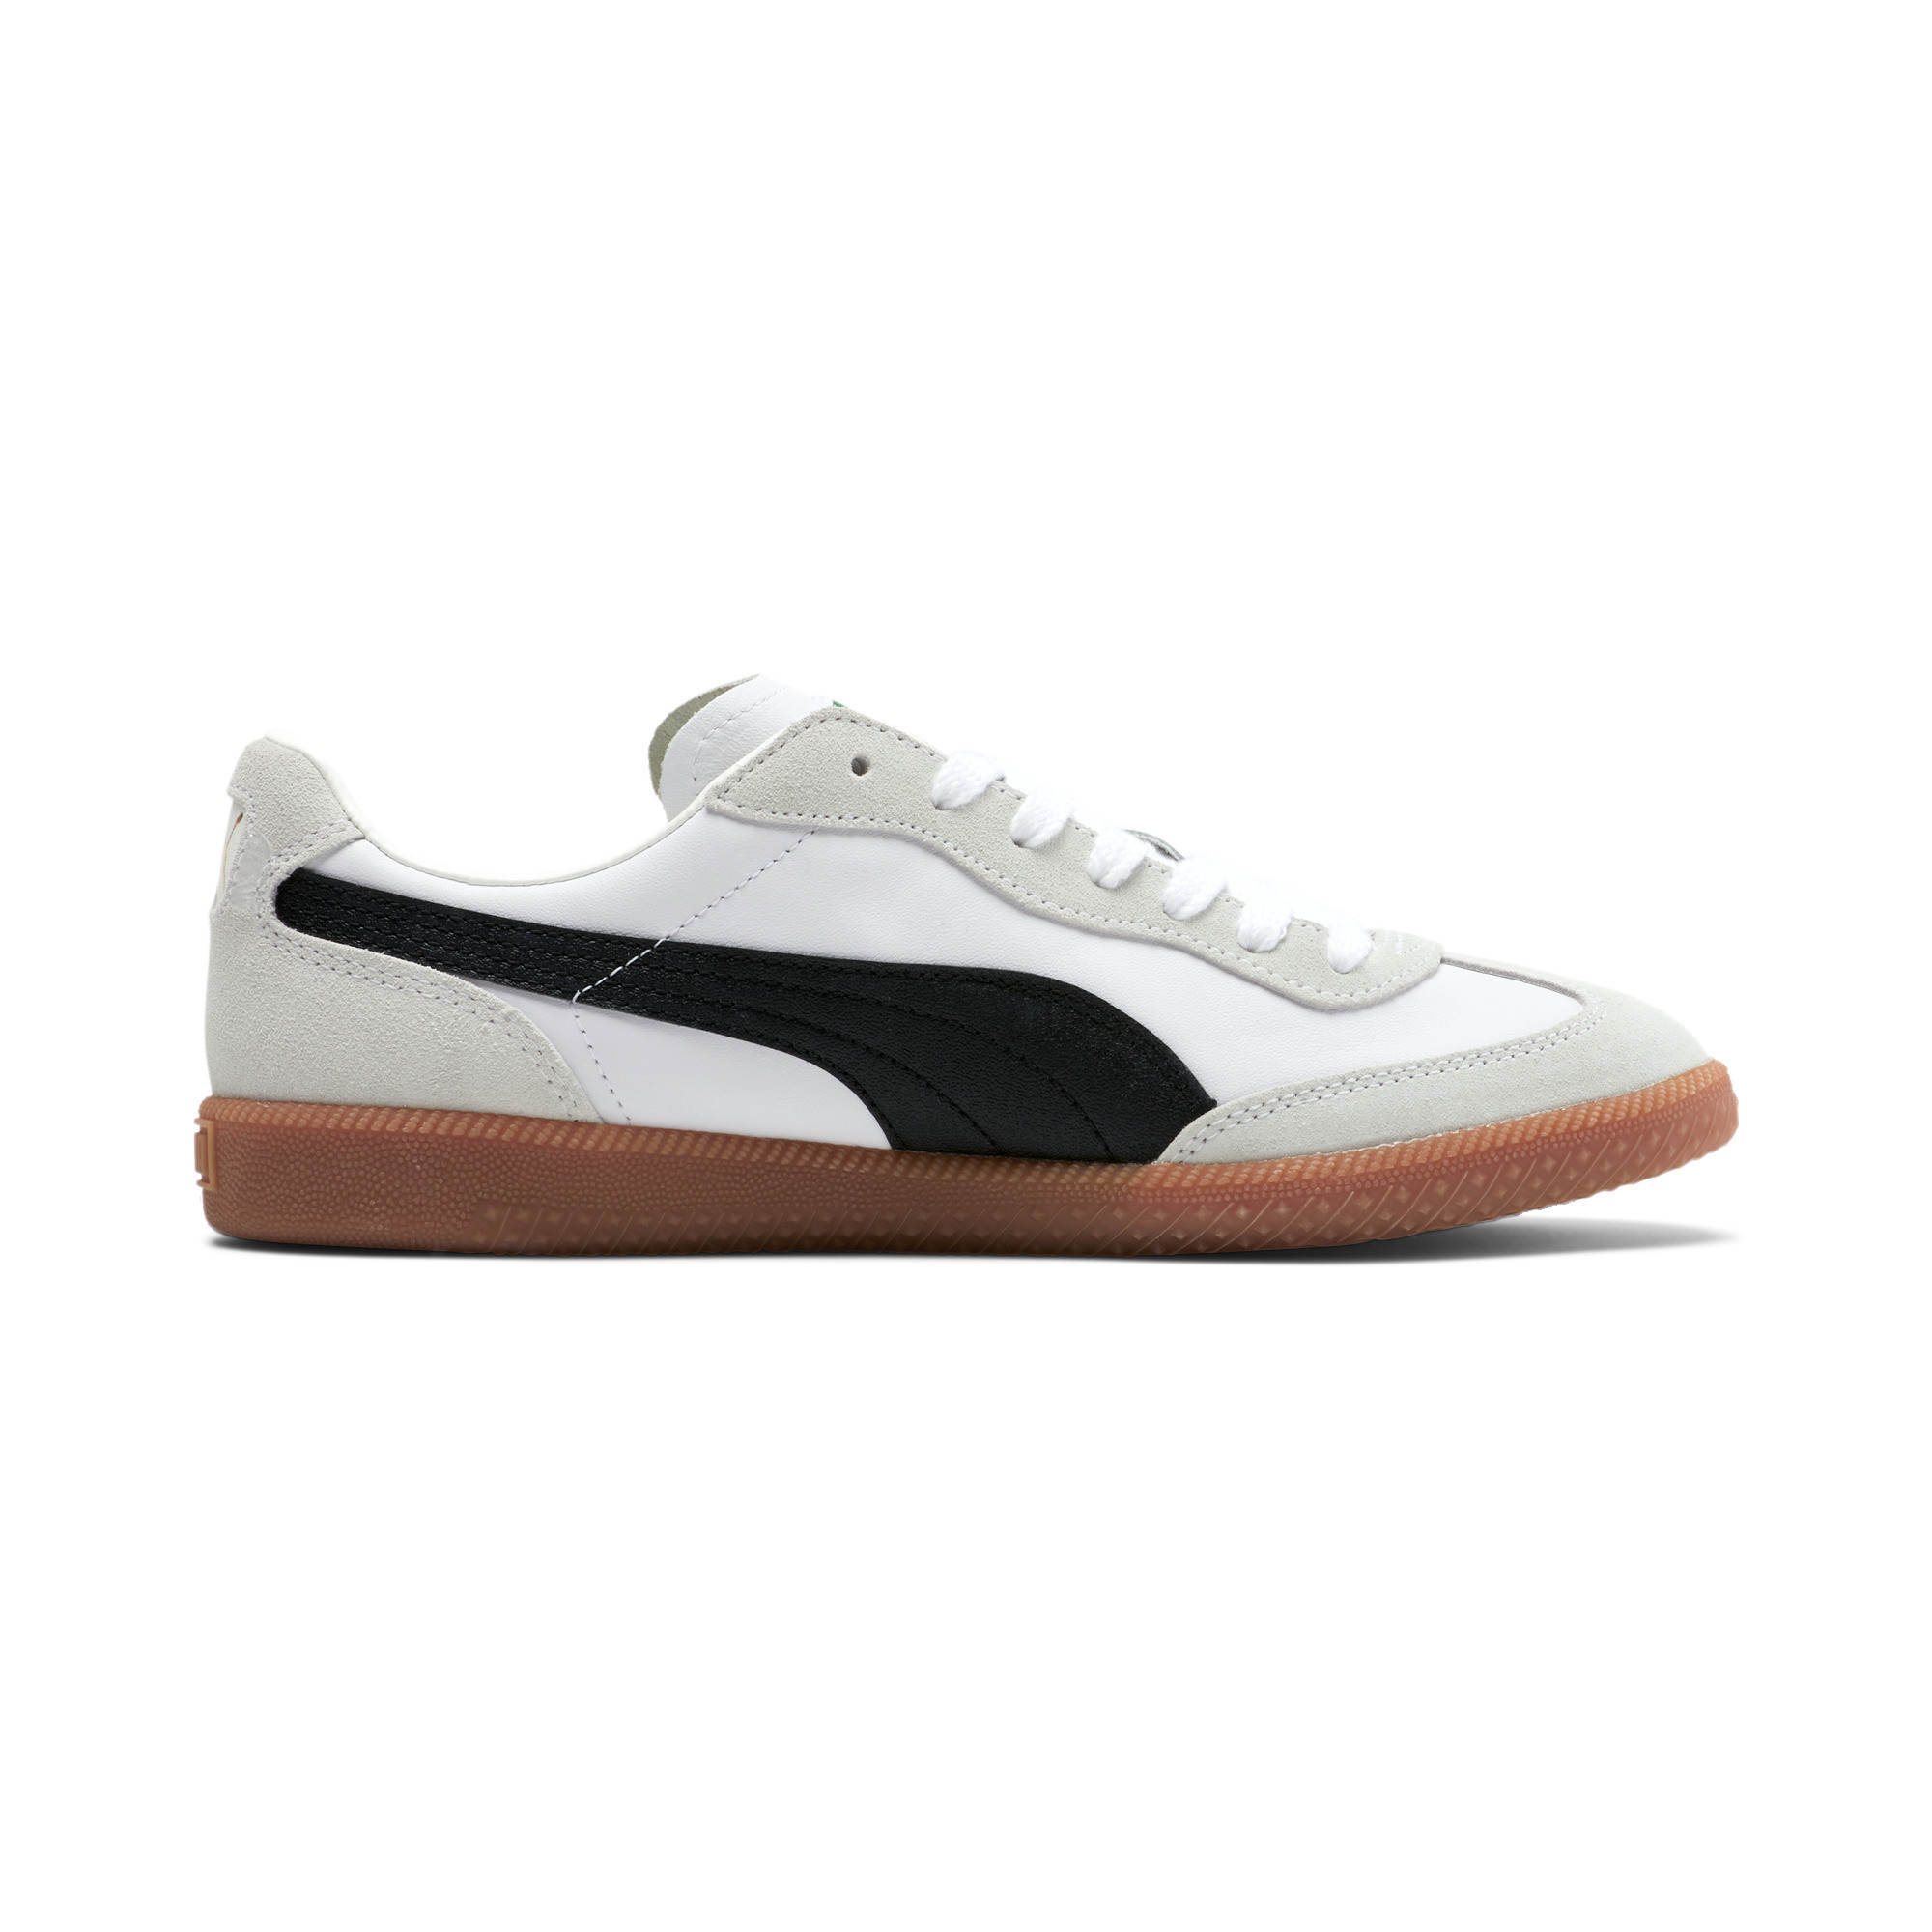 PUMA Men's Super Liga OG Retro Sneakers   eBay